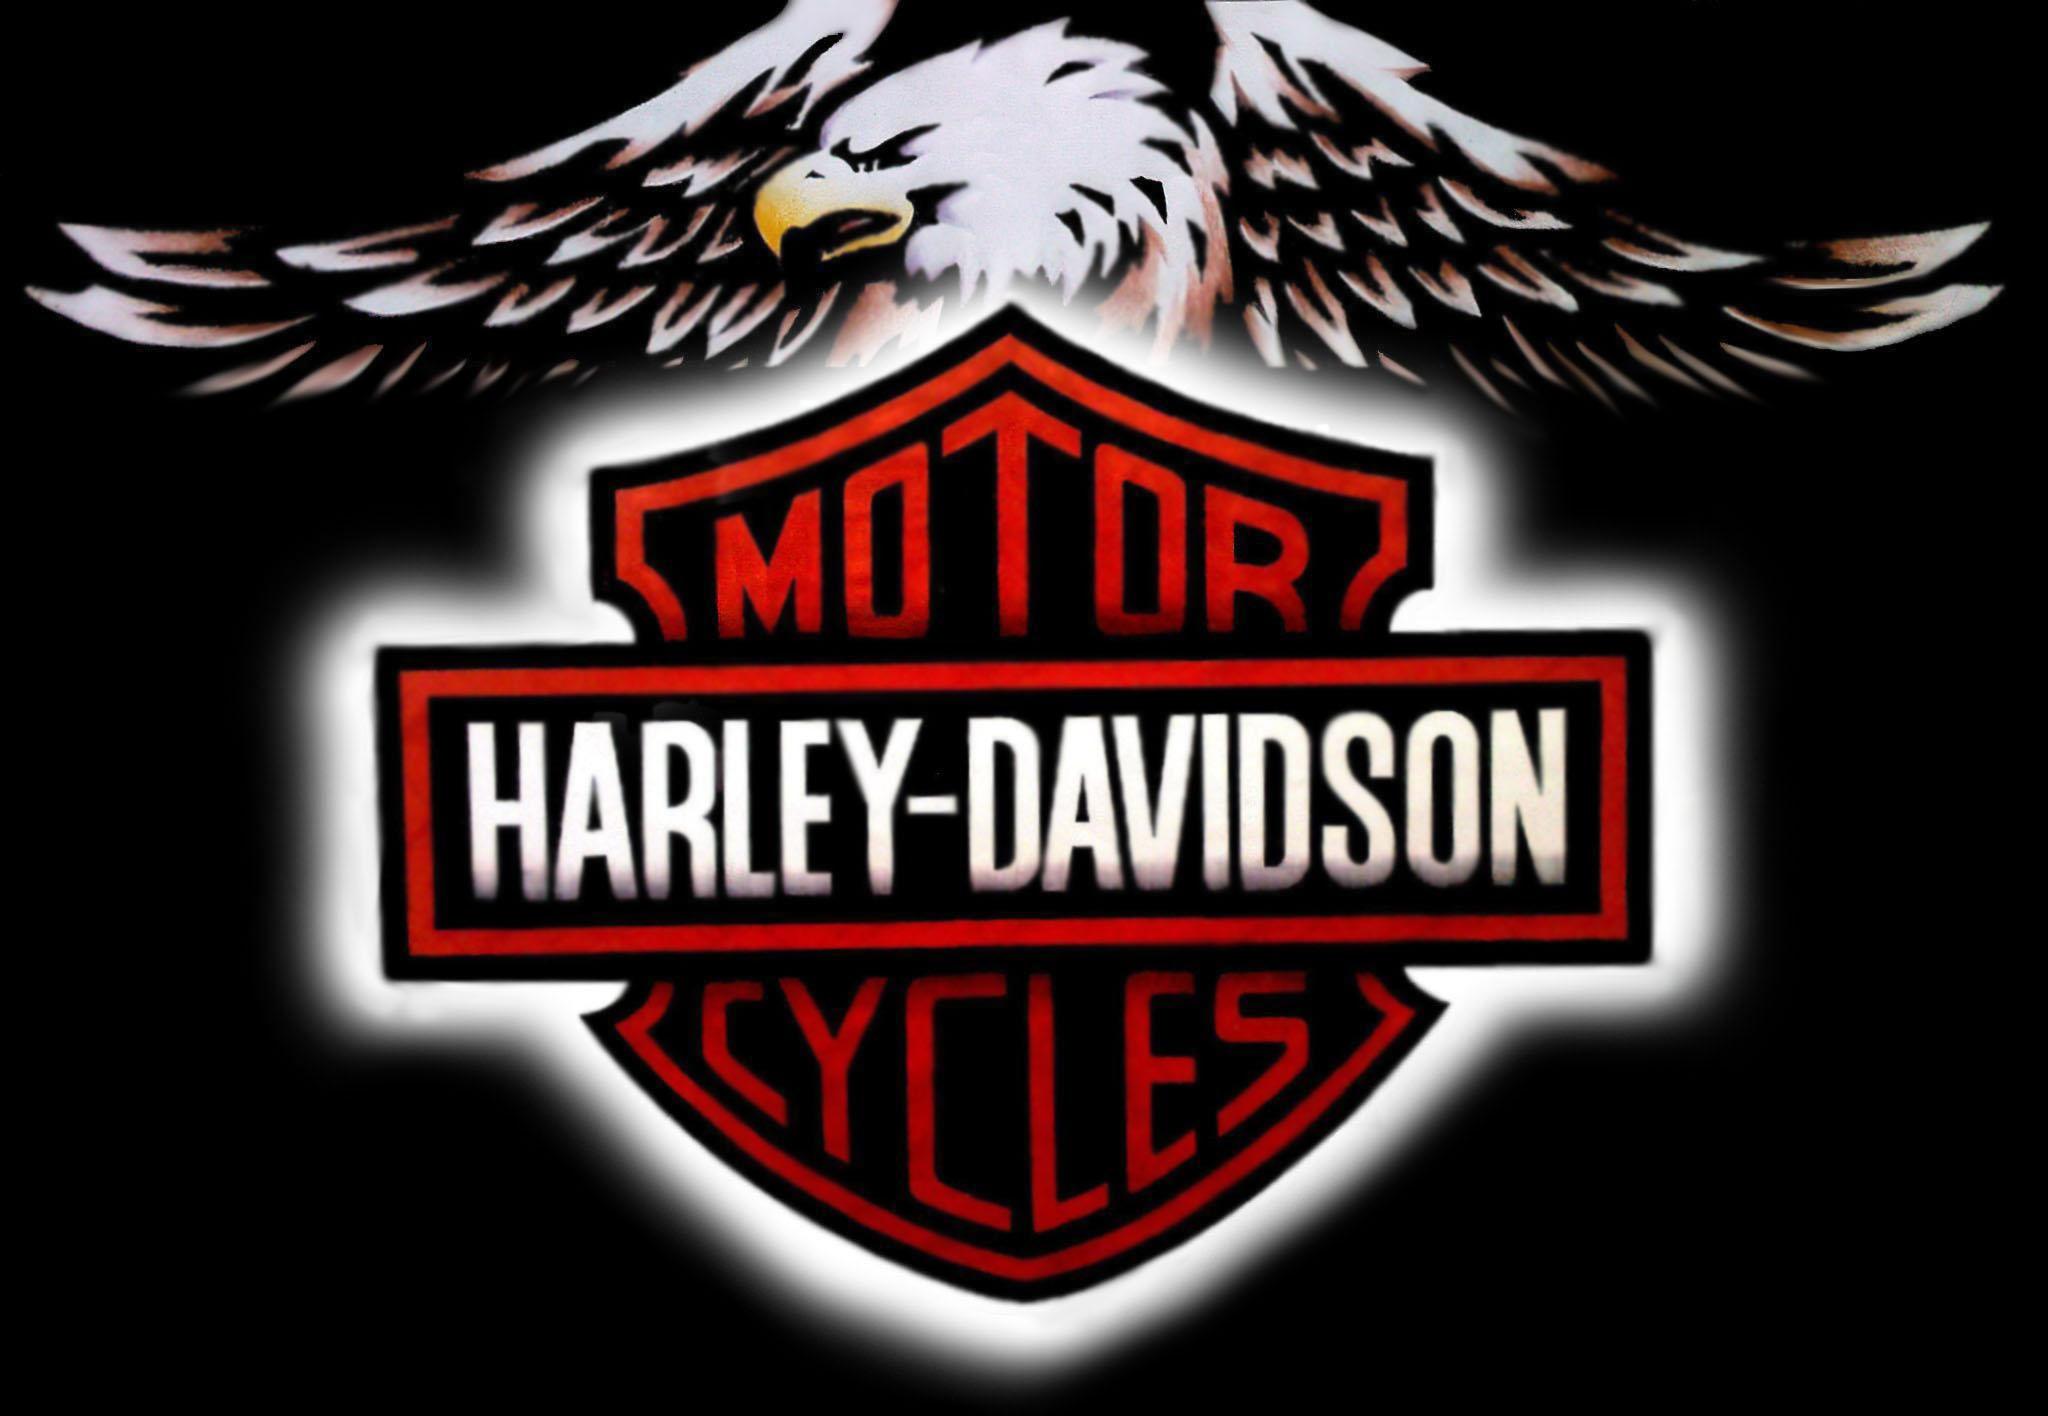 Harley Davidson Eagle Wallpaper wallpaper wallpaper hd 2048x1416